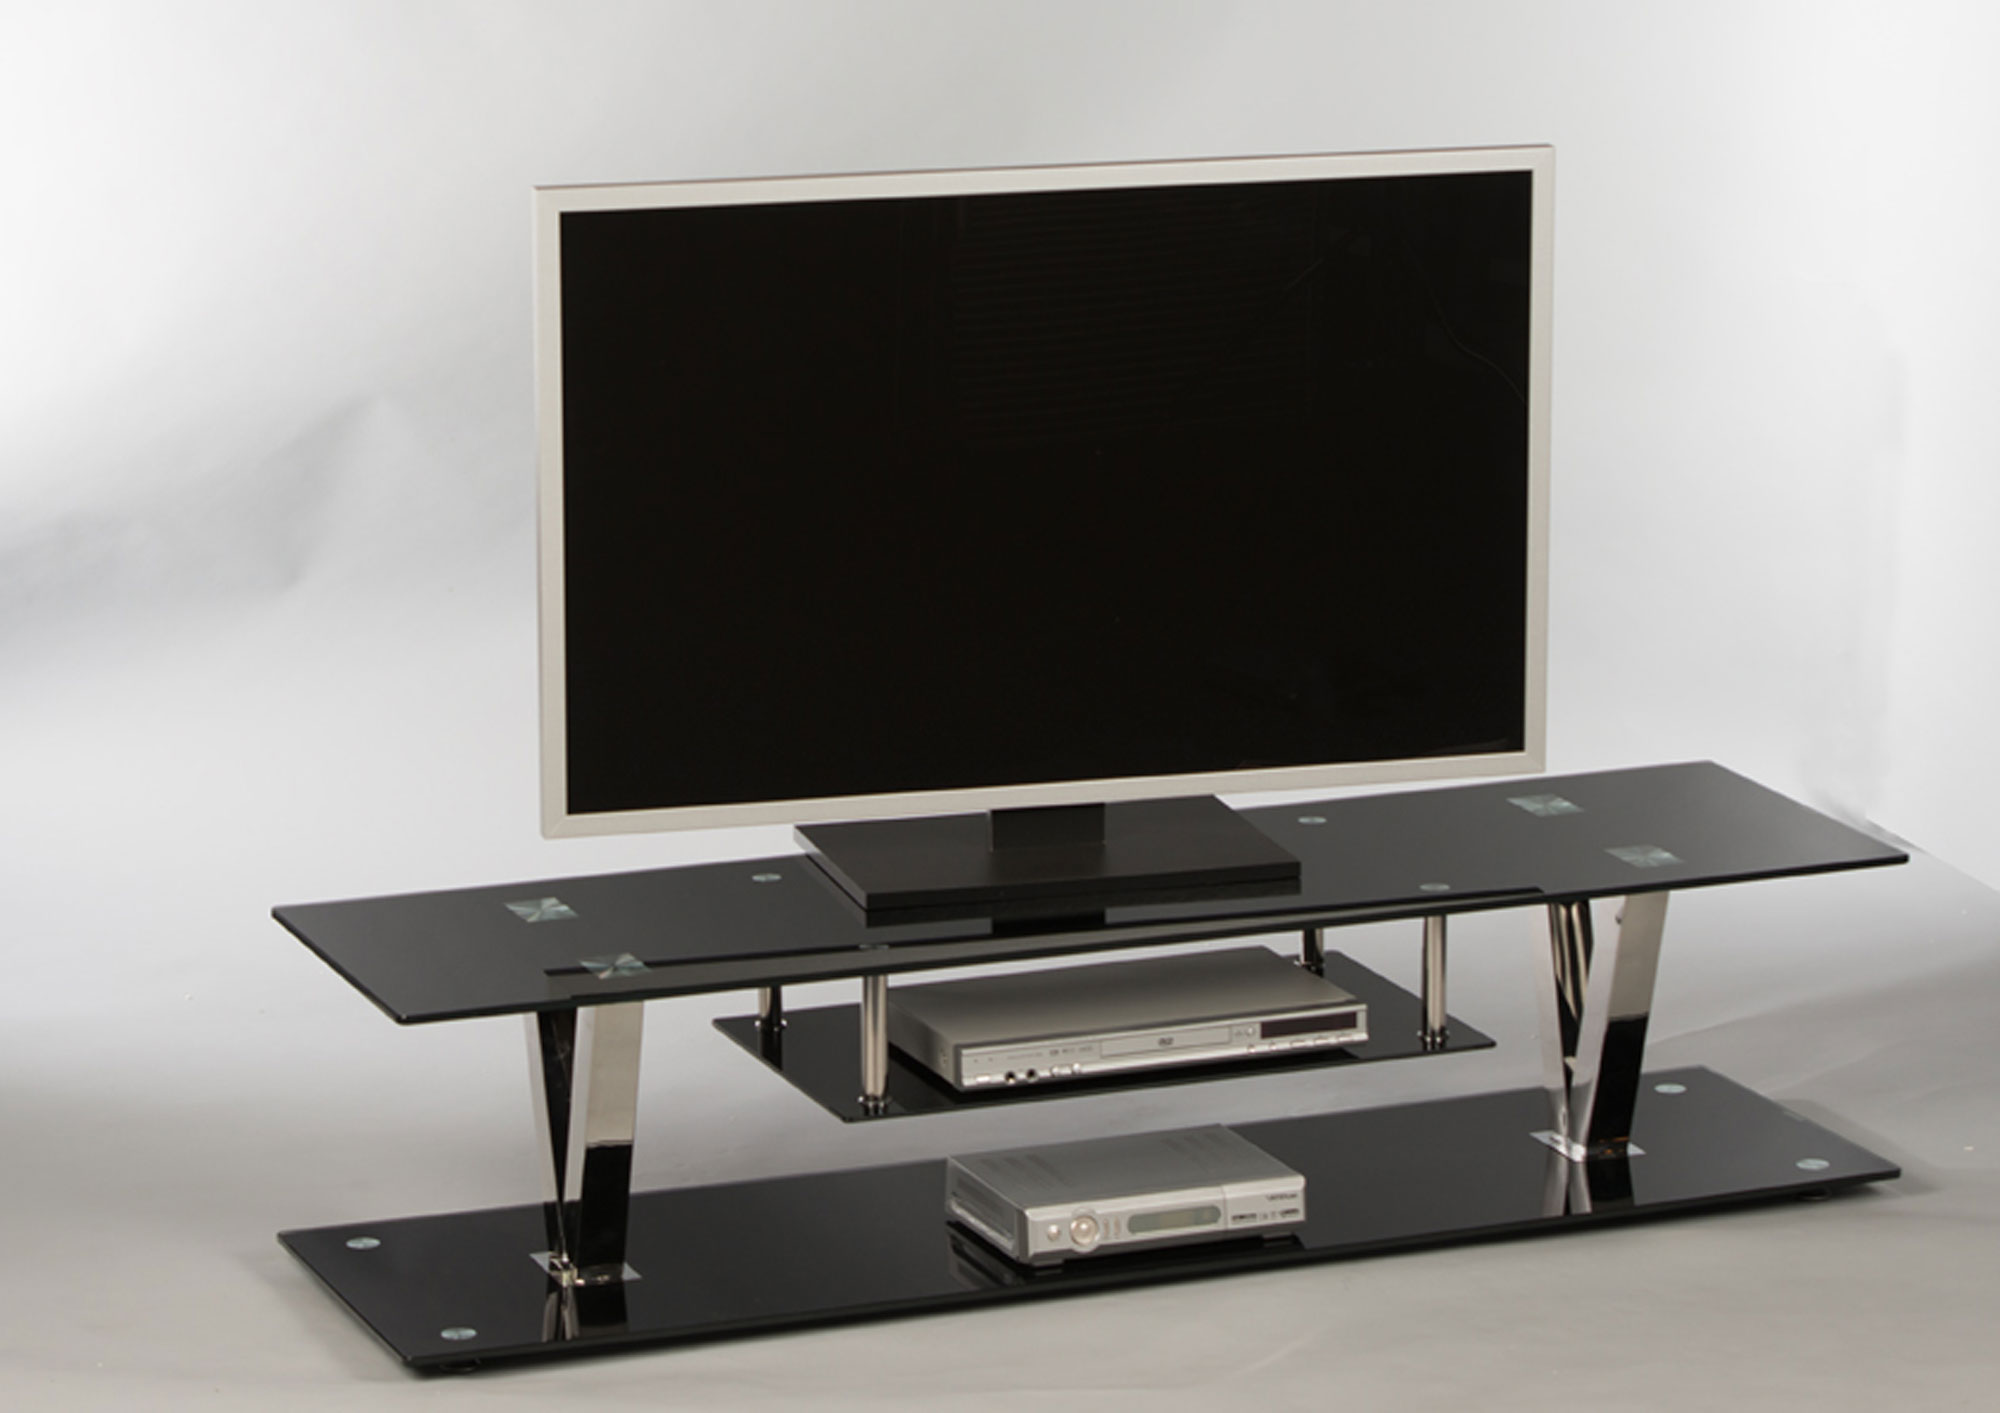 Lowboard Tv Board Fernsehschrank Tv Bank Tv Rack Schwarz Glas